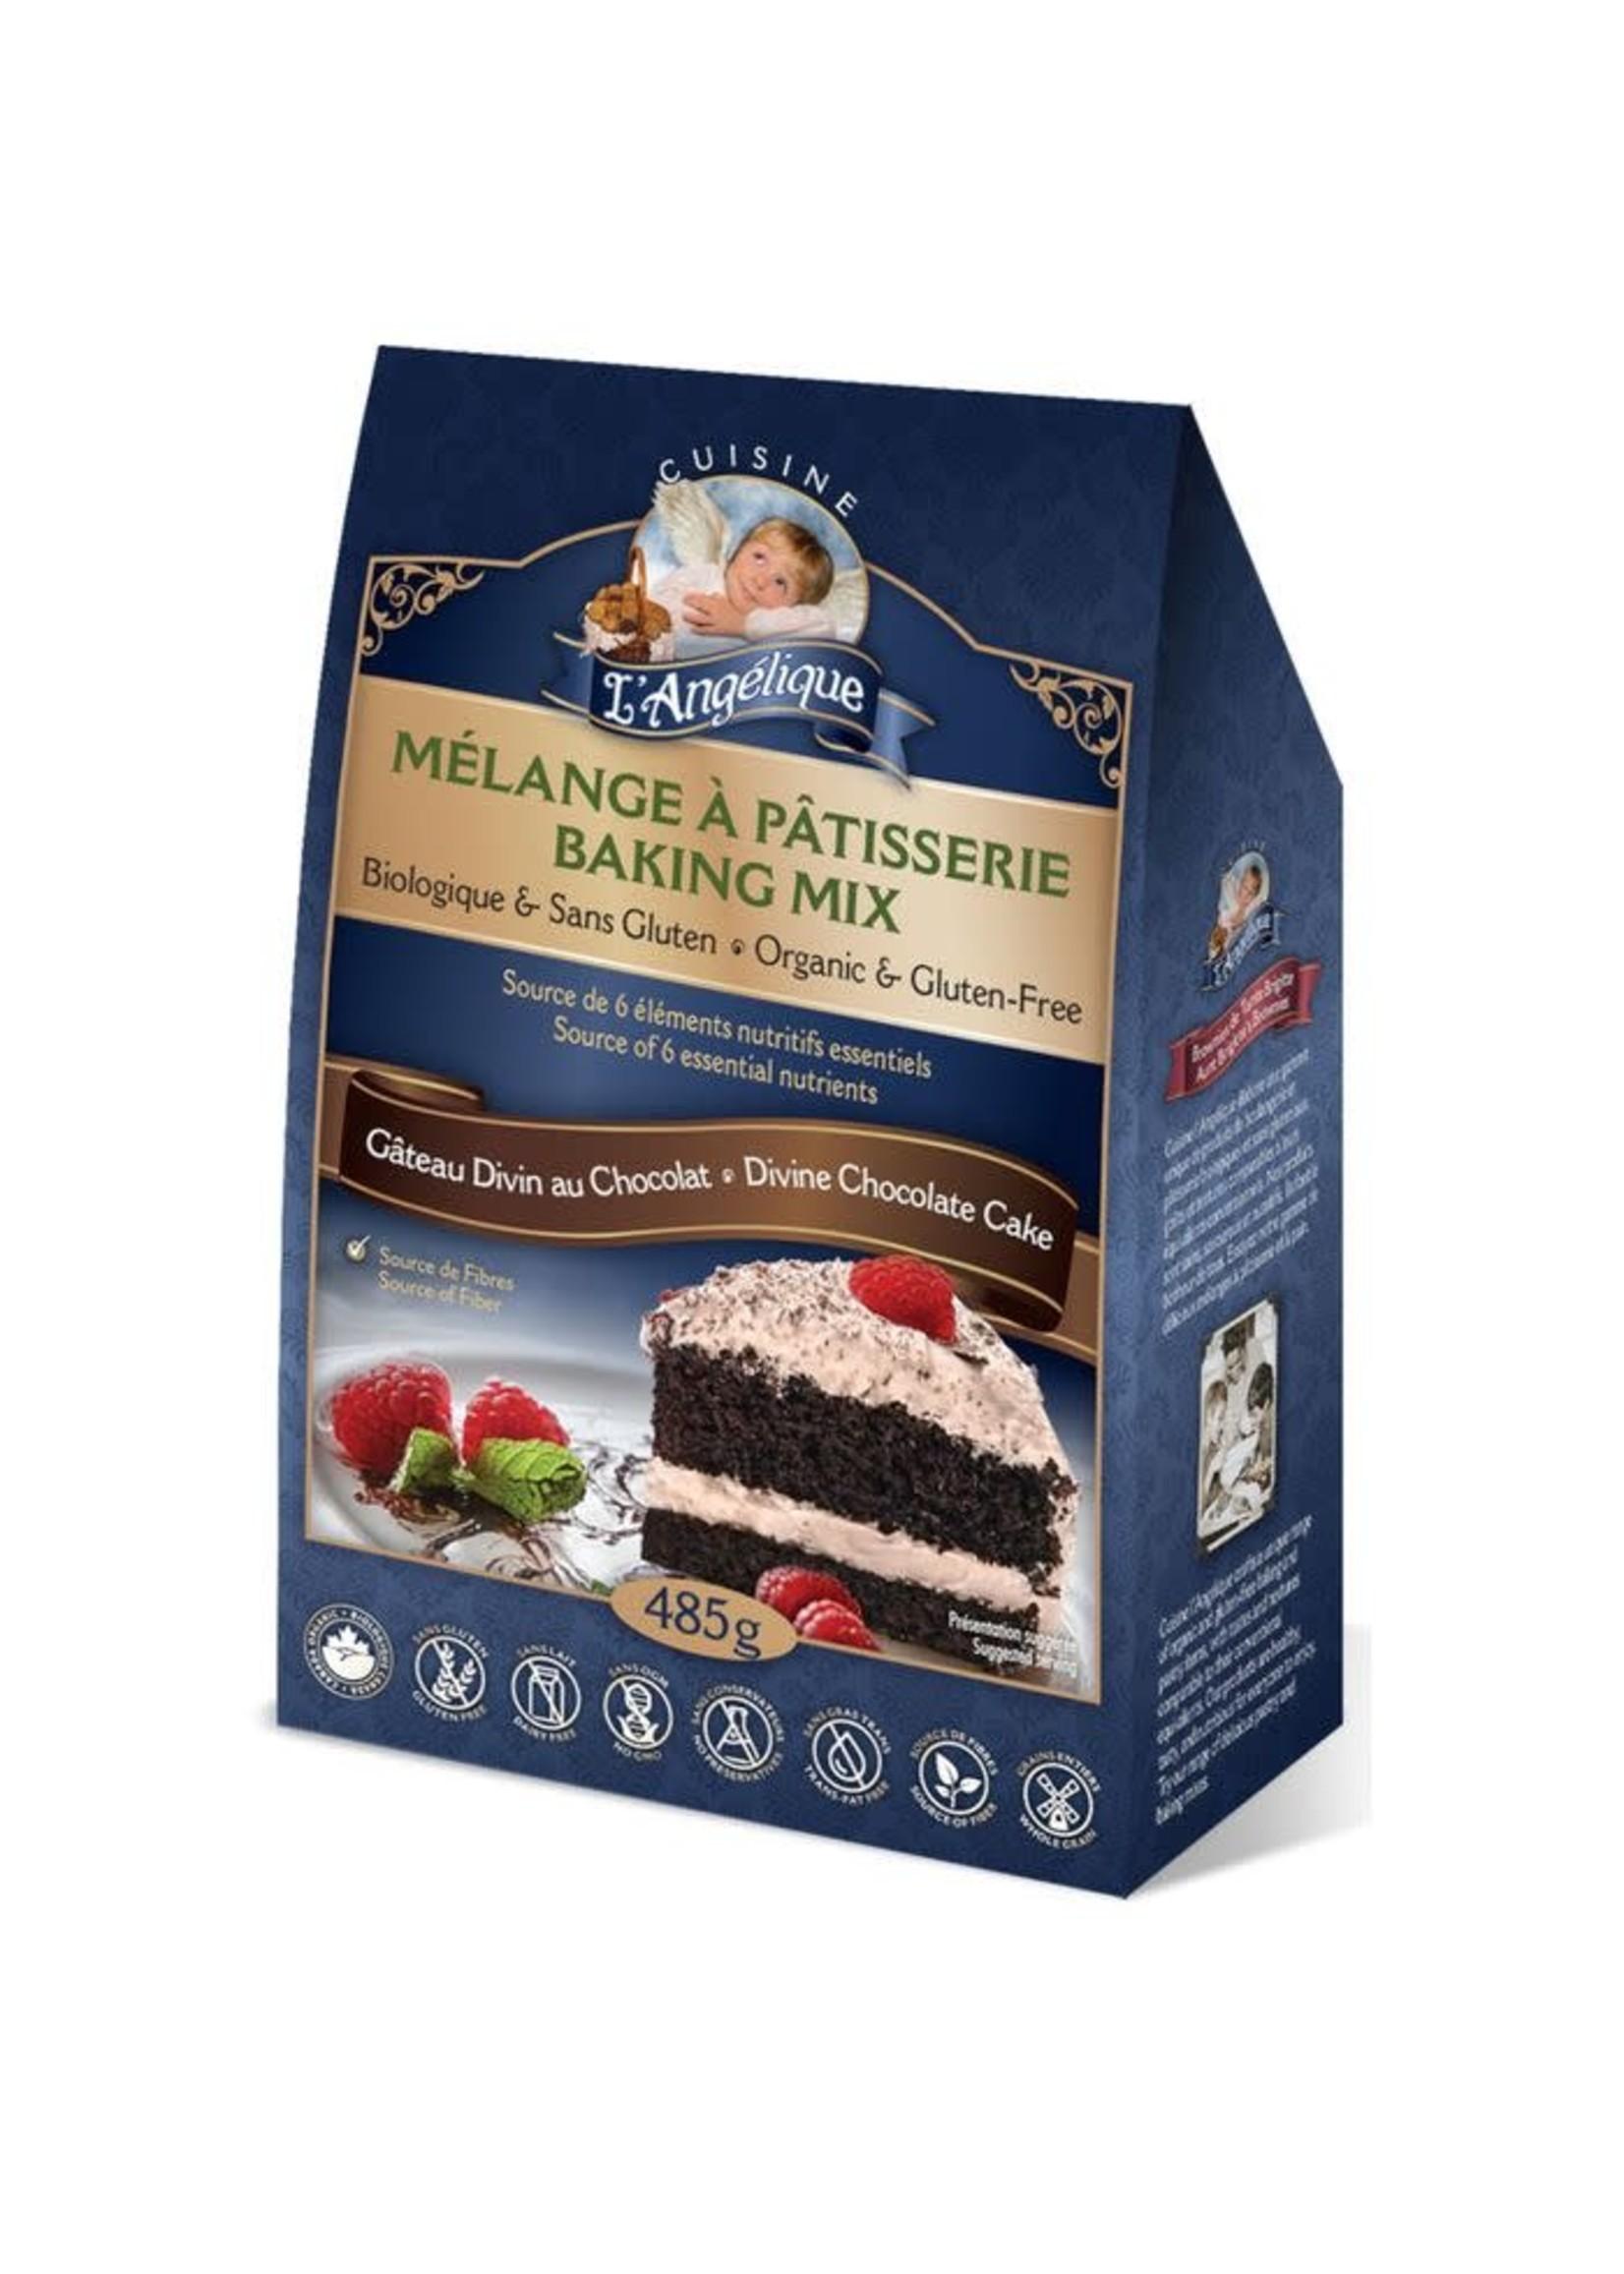 Cuisine L'Angelique Cuisine L'Angelique Gluten-Free & Organic- Chocolate Divine